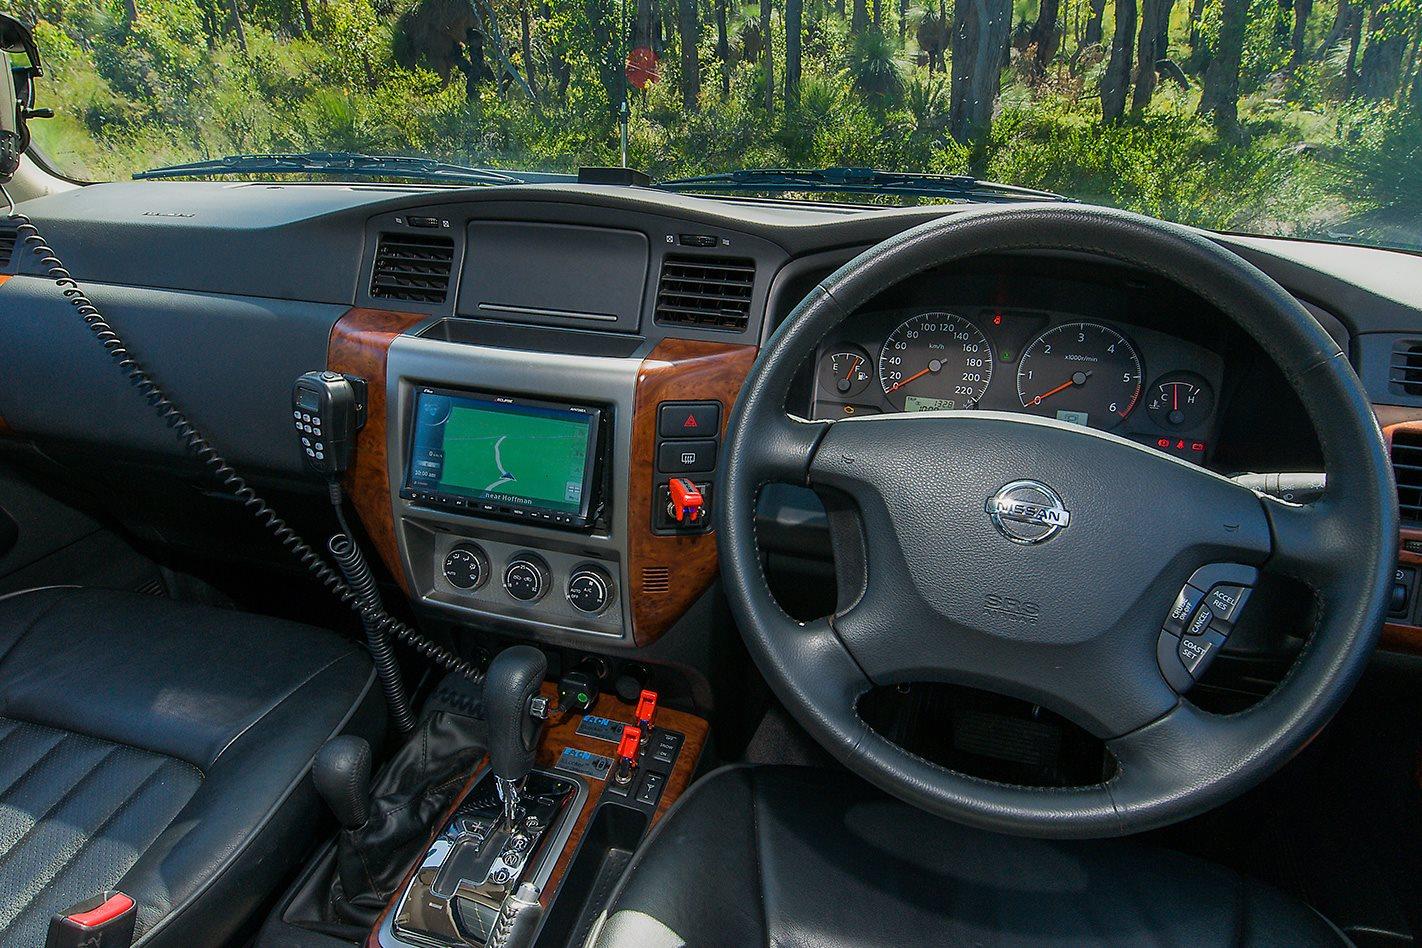 2010 Nissan Patrol GU Ti custom review